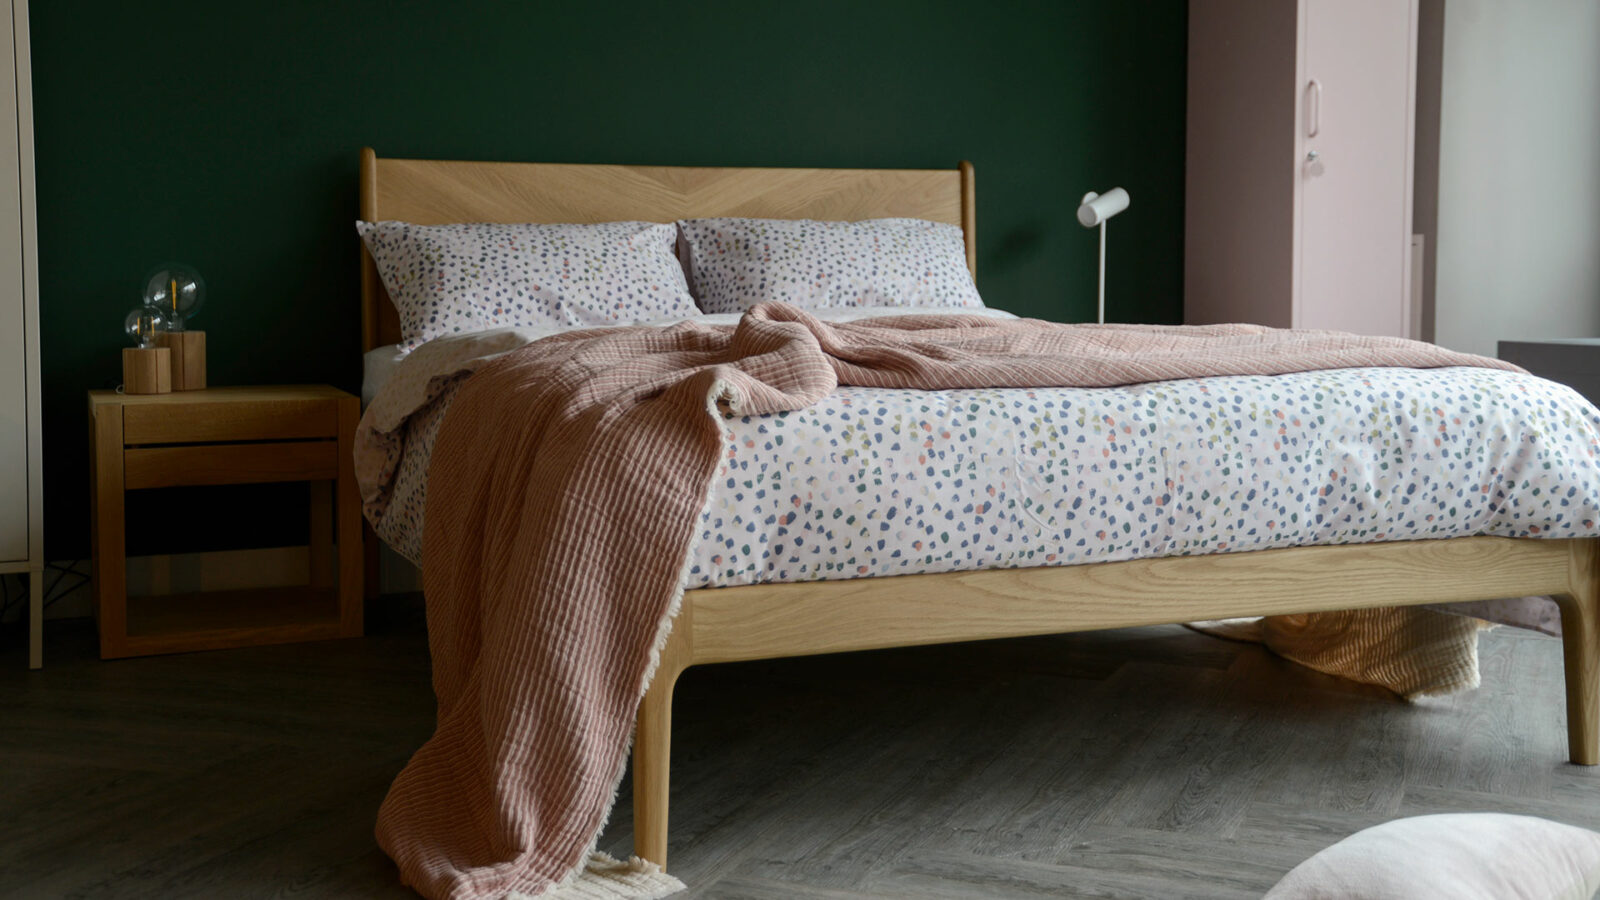 reversible cotton blend duvet cover set with pastel colours paint brush dots print and shown on oak Hoxton bed